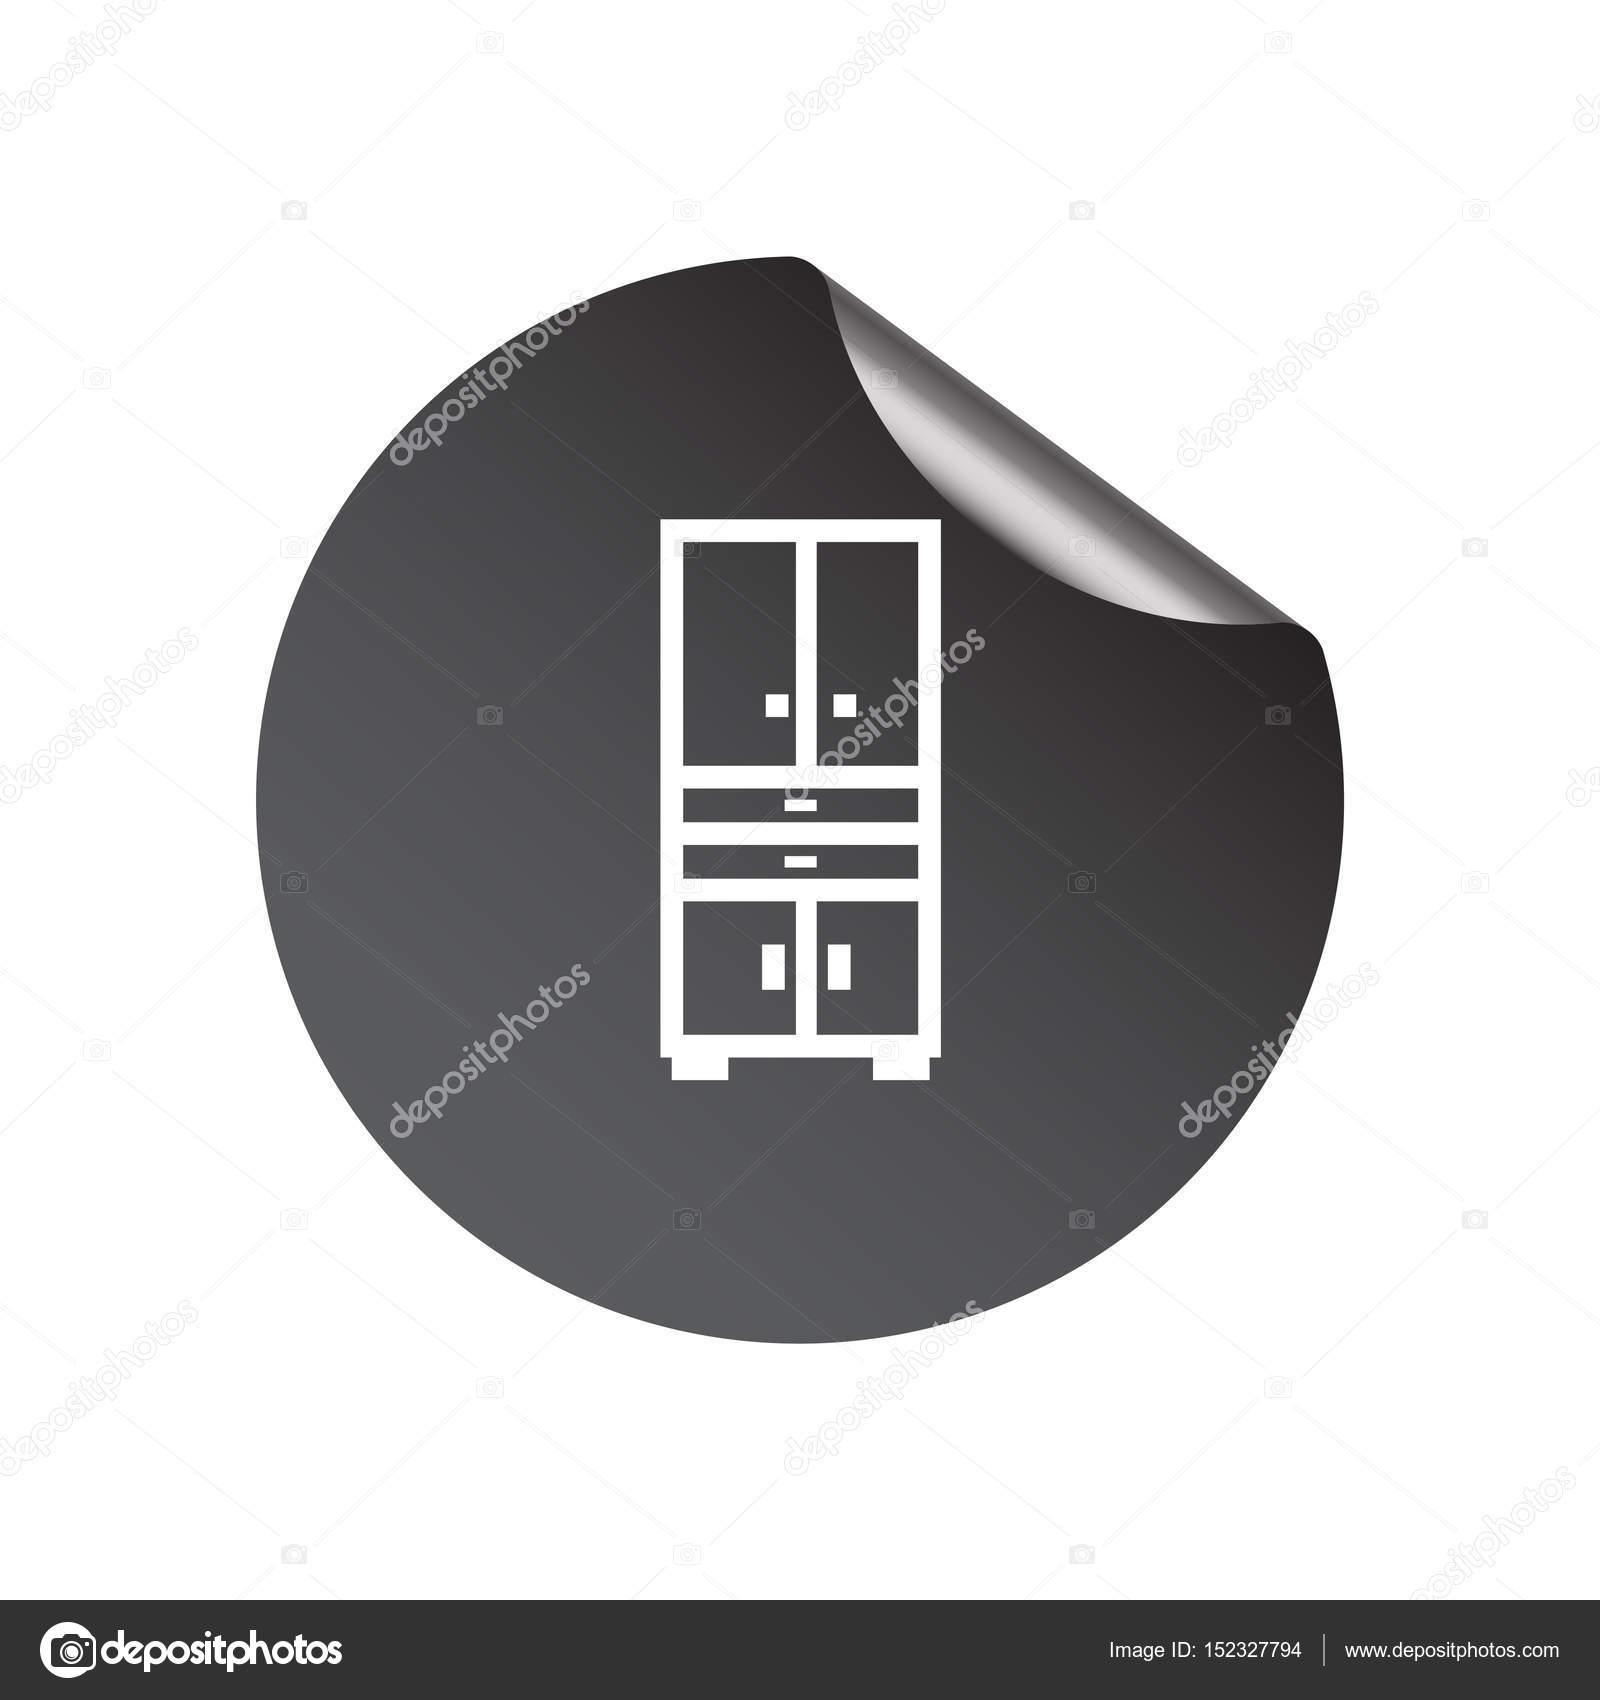 Kleiderschrank-flach-Symbol — Stockvektor © LovArt #152327794